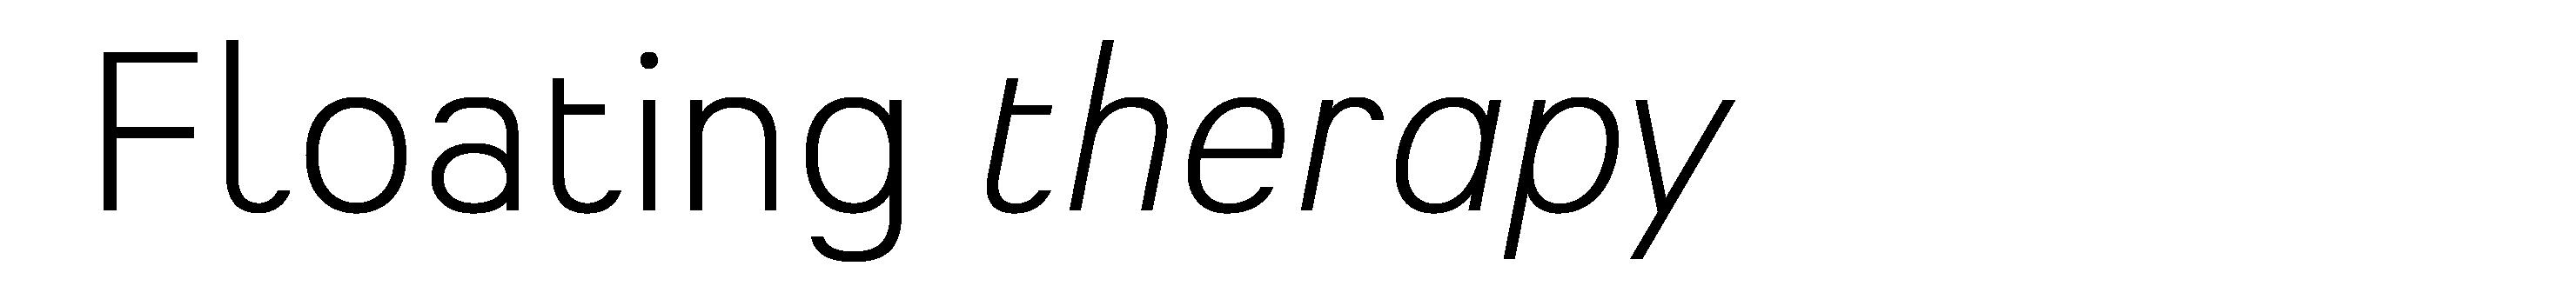 Typeface Heimat Sans D08 Atlas Font Foundry